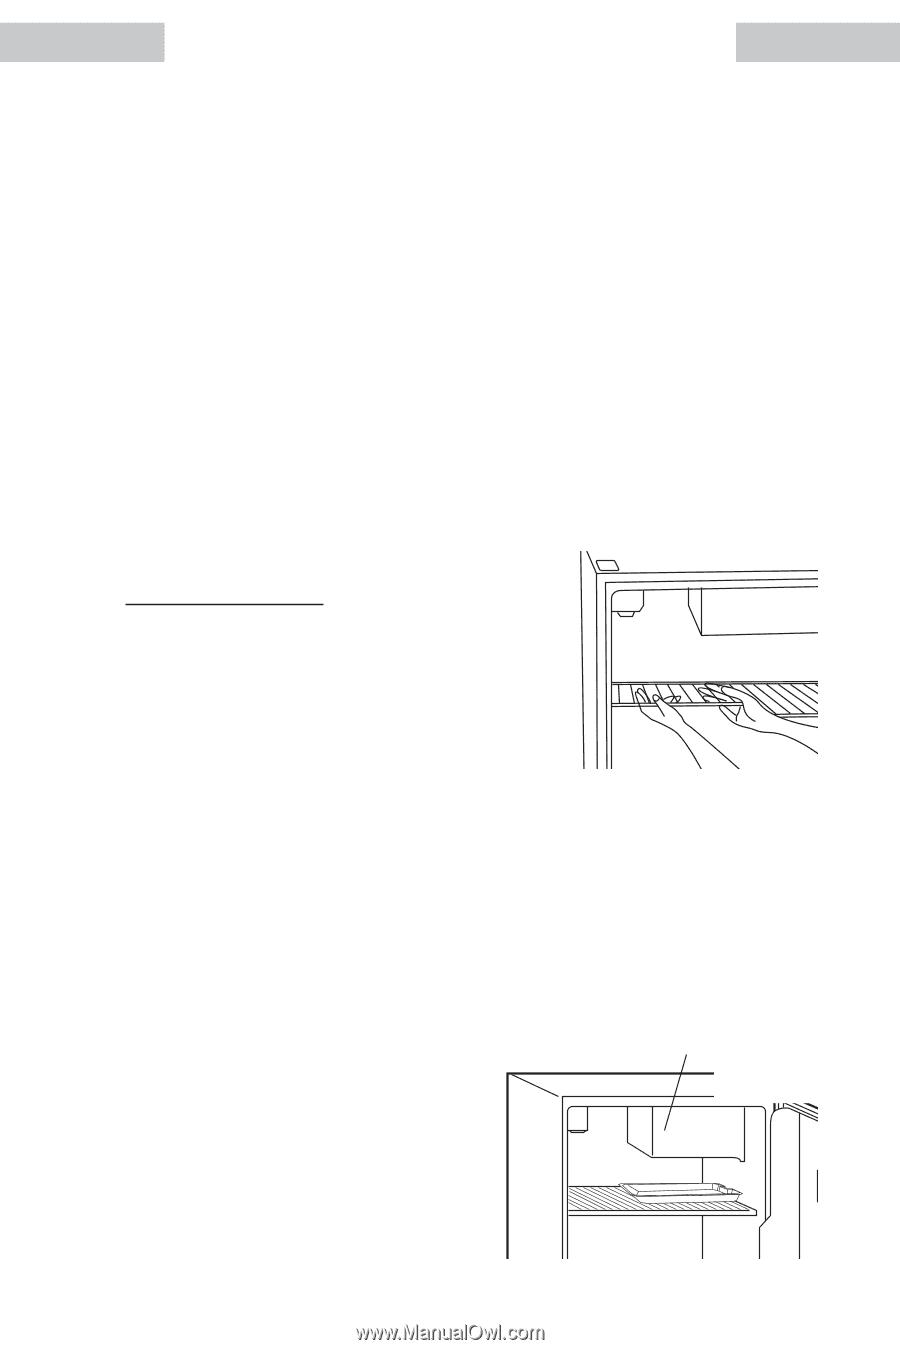 Haier Model Hsa04wncbb Wiring Diagram 1997 Honda Accord ... on